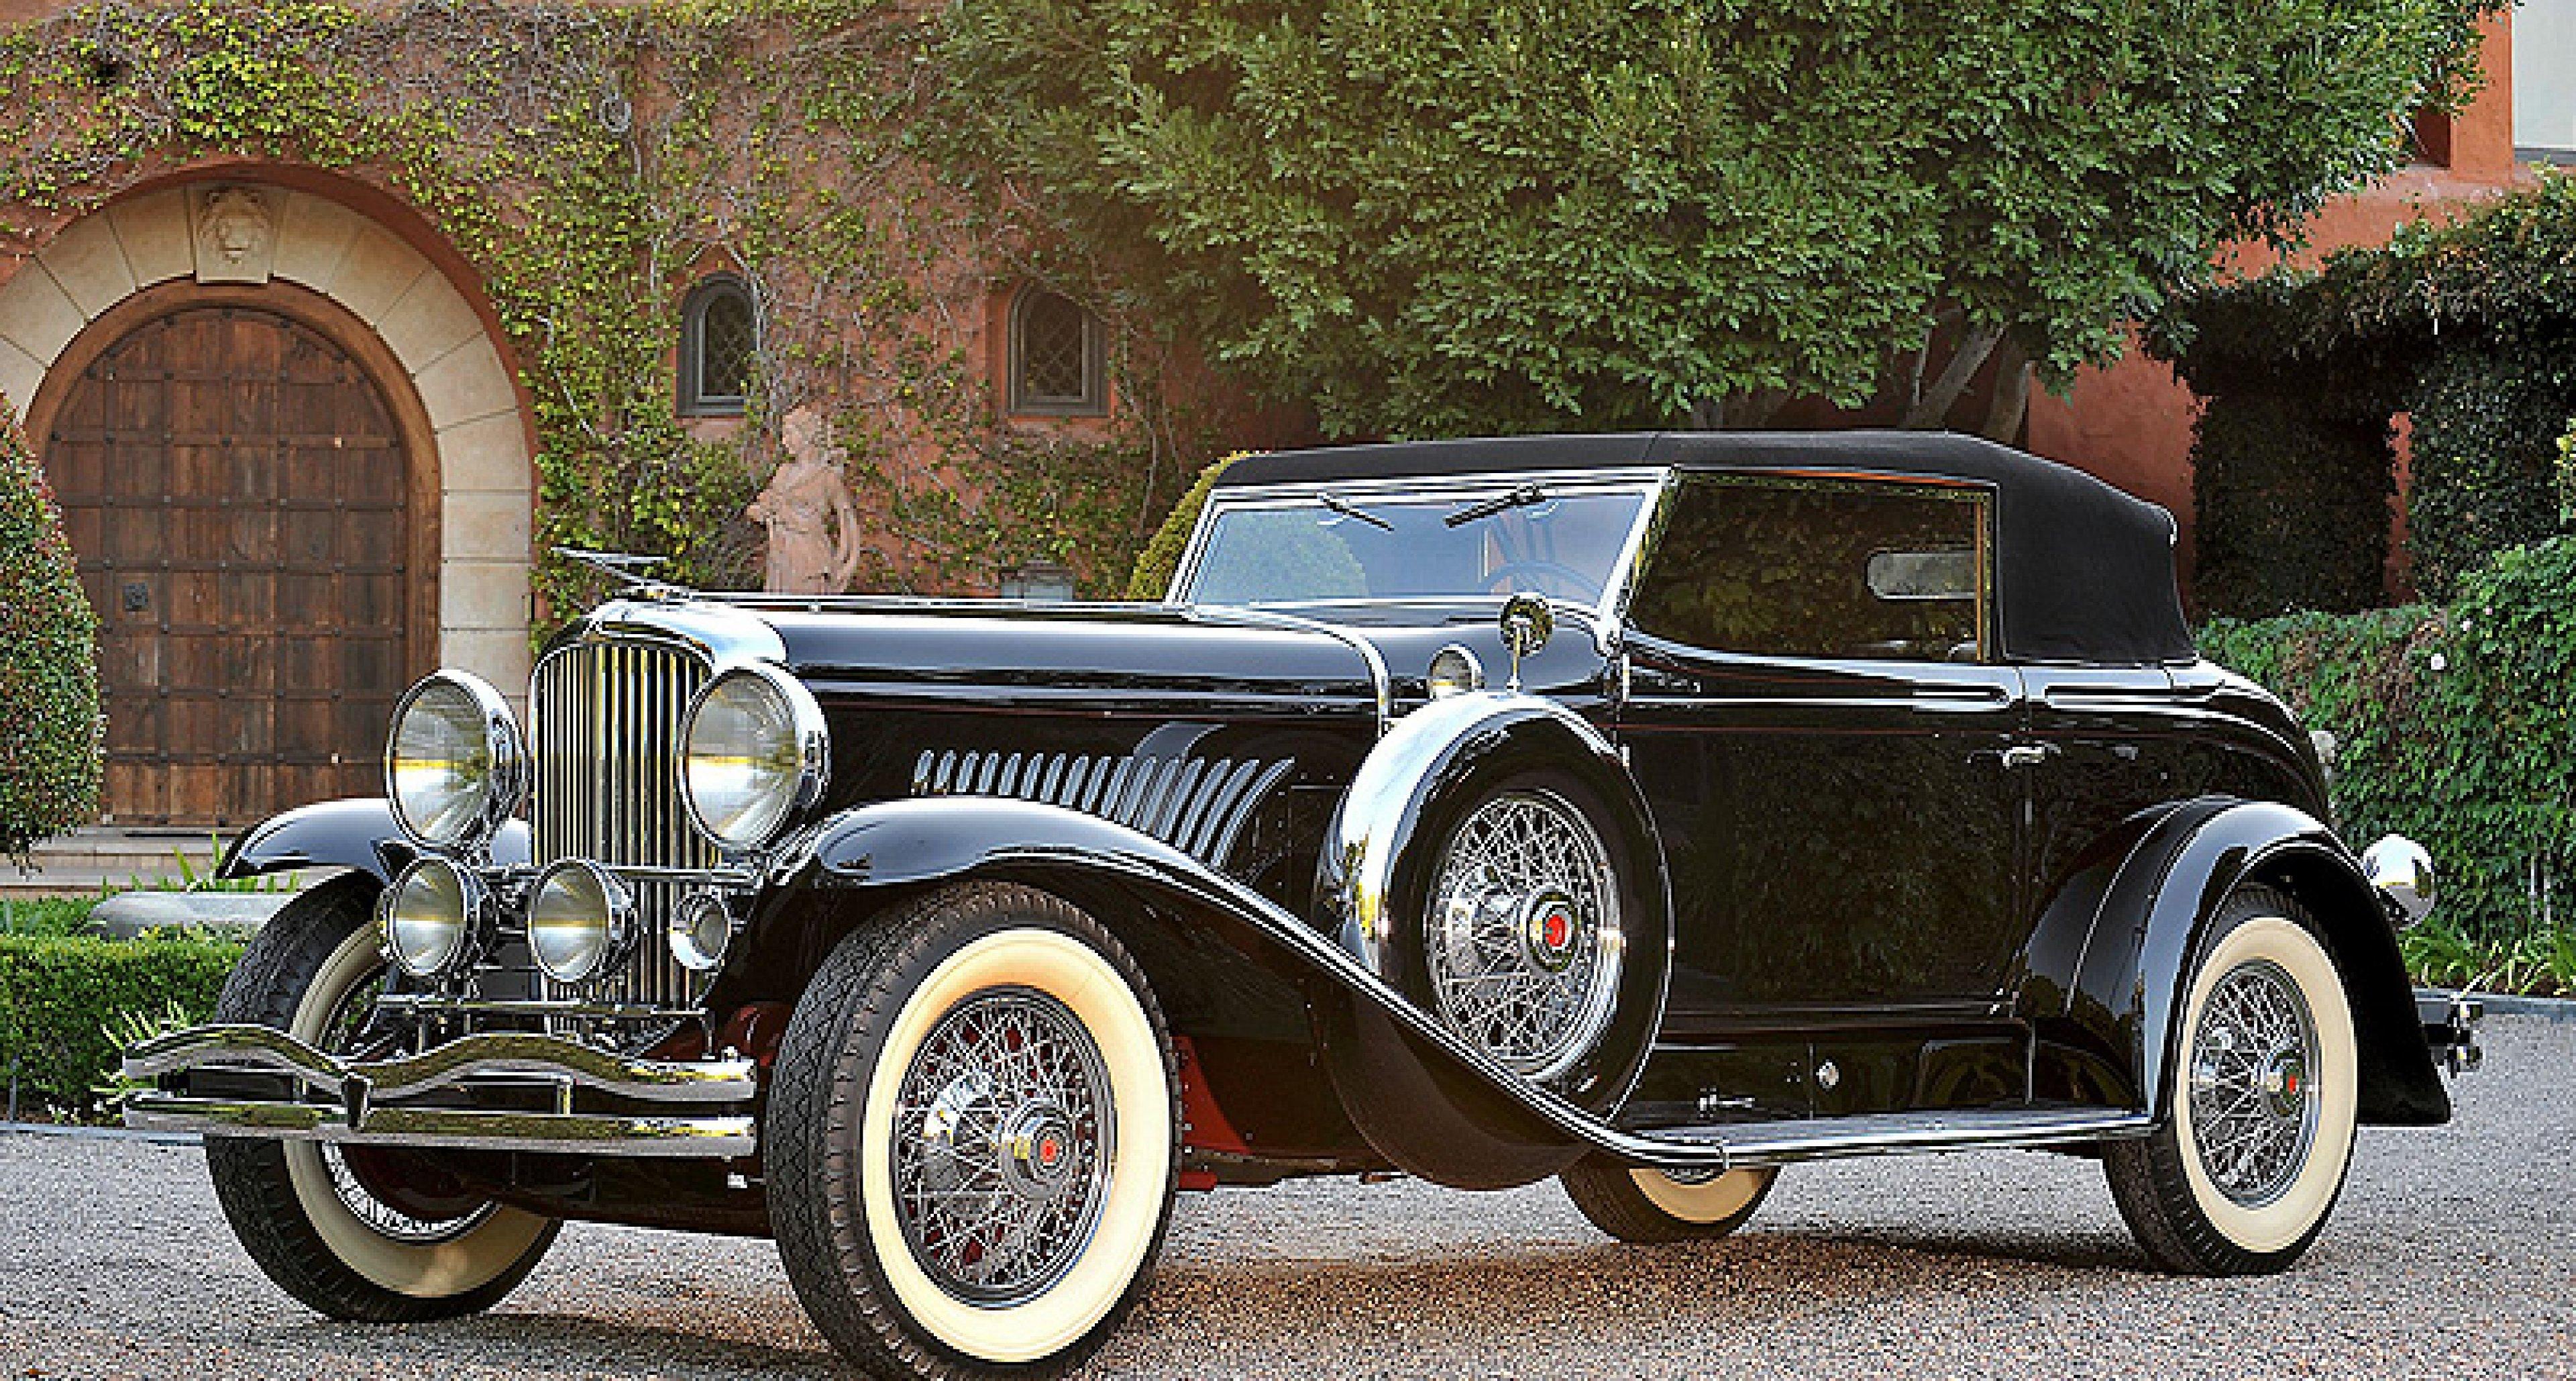 Bonhams & Butterfields Quail Lodge: The Sid Craig Collection